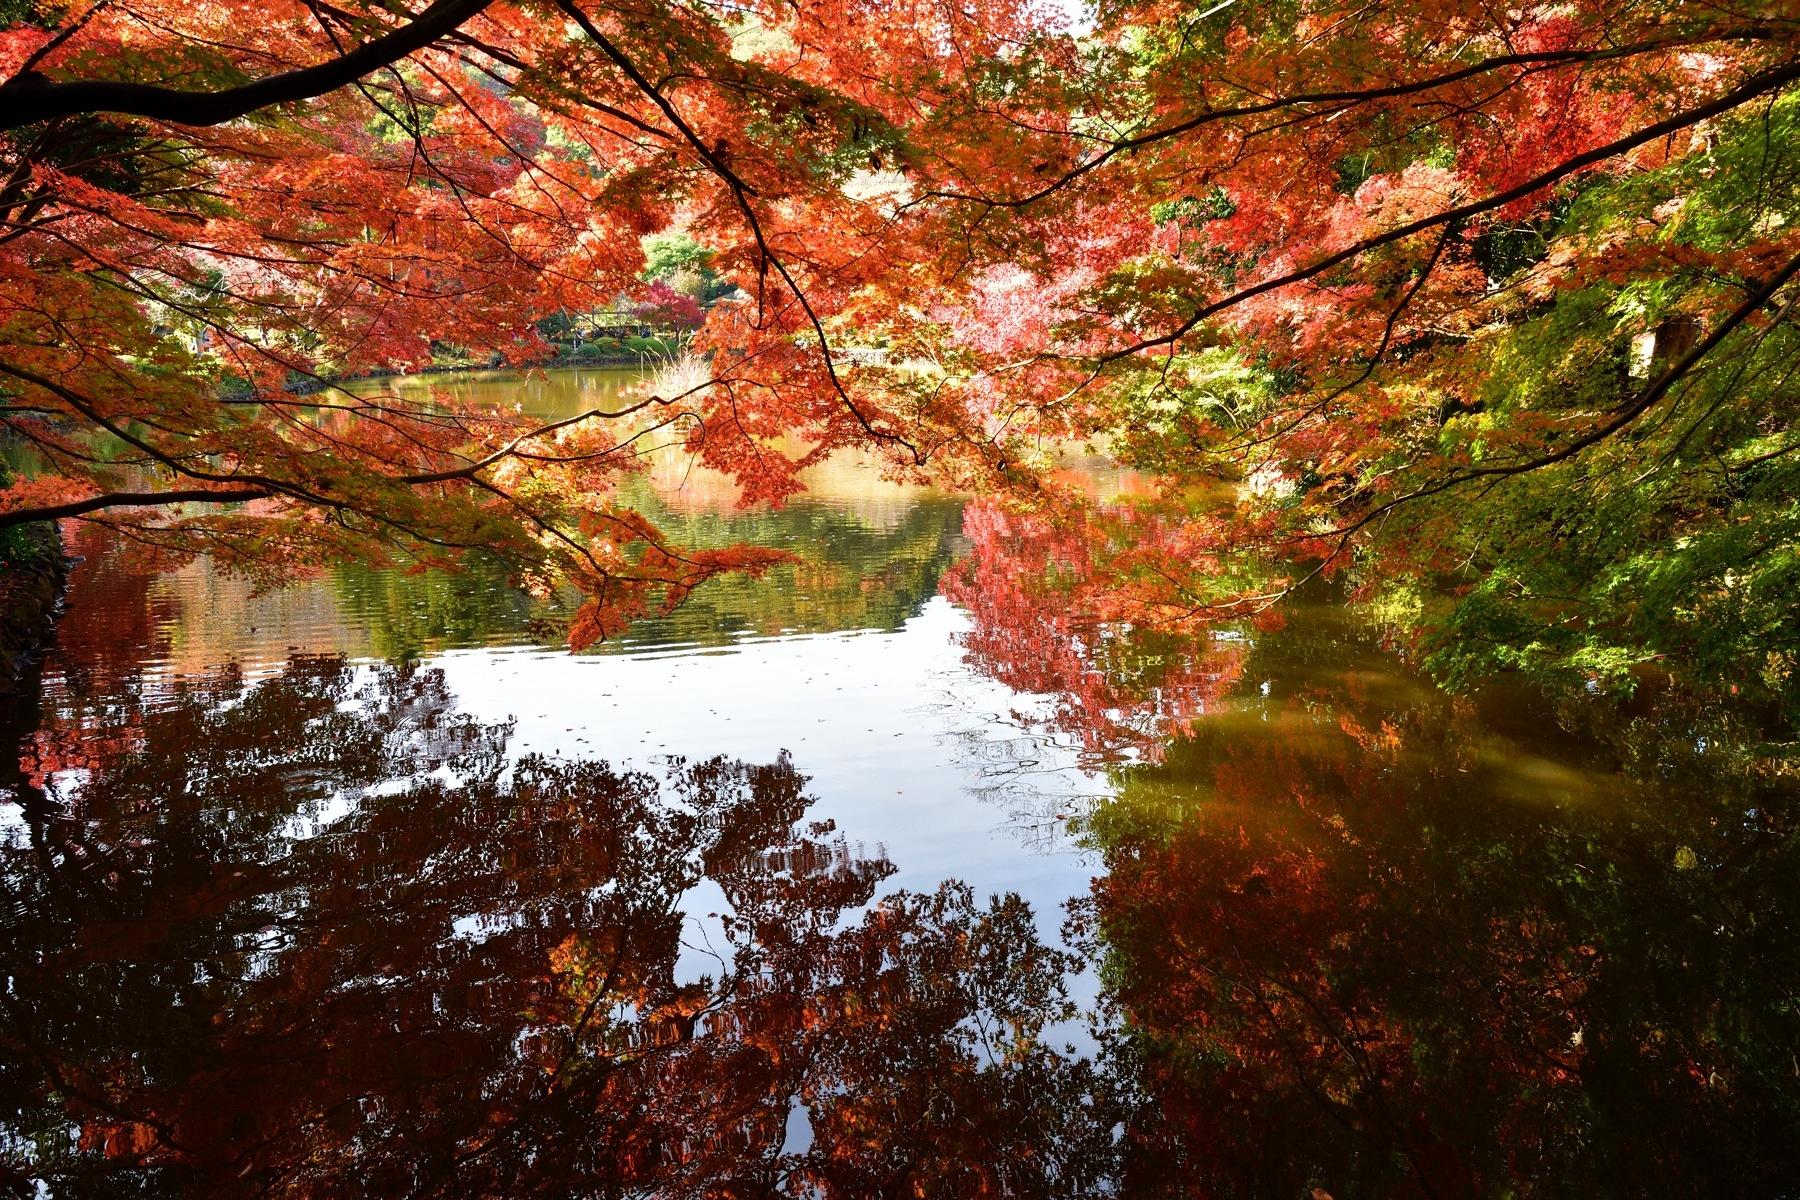 Autumn Foliage by Mubi.A